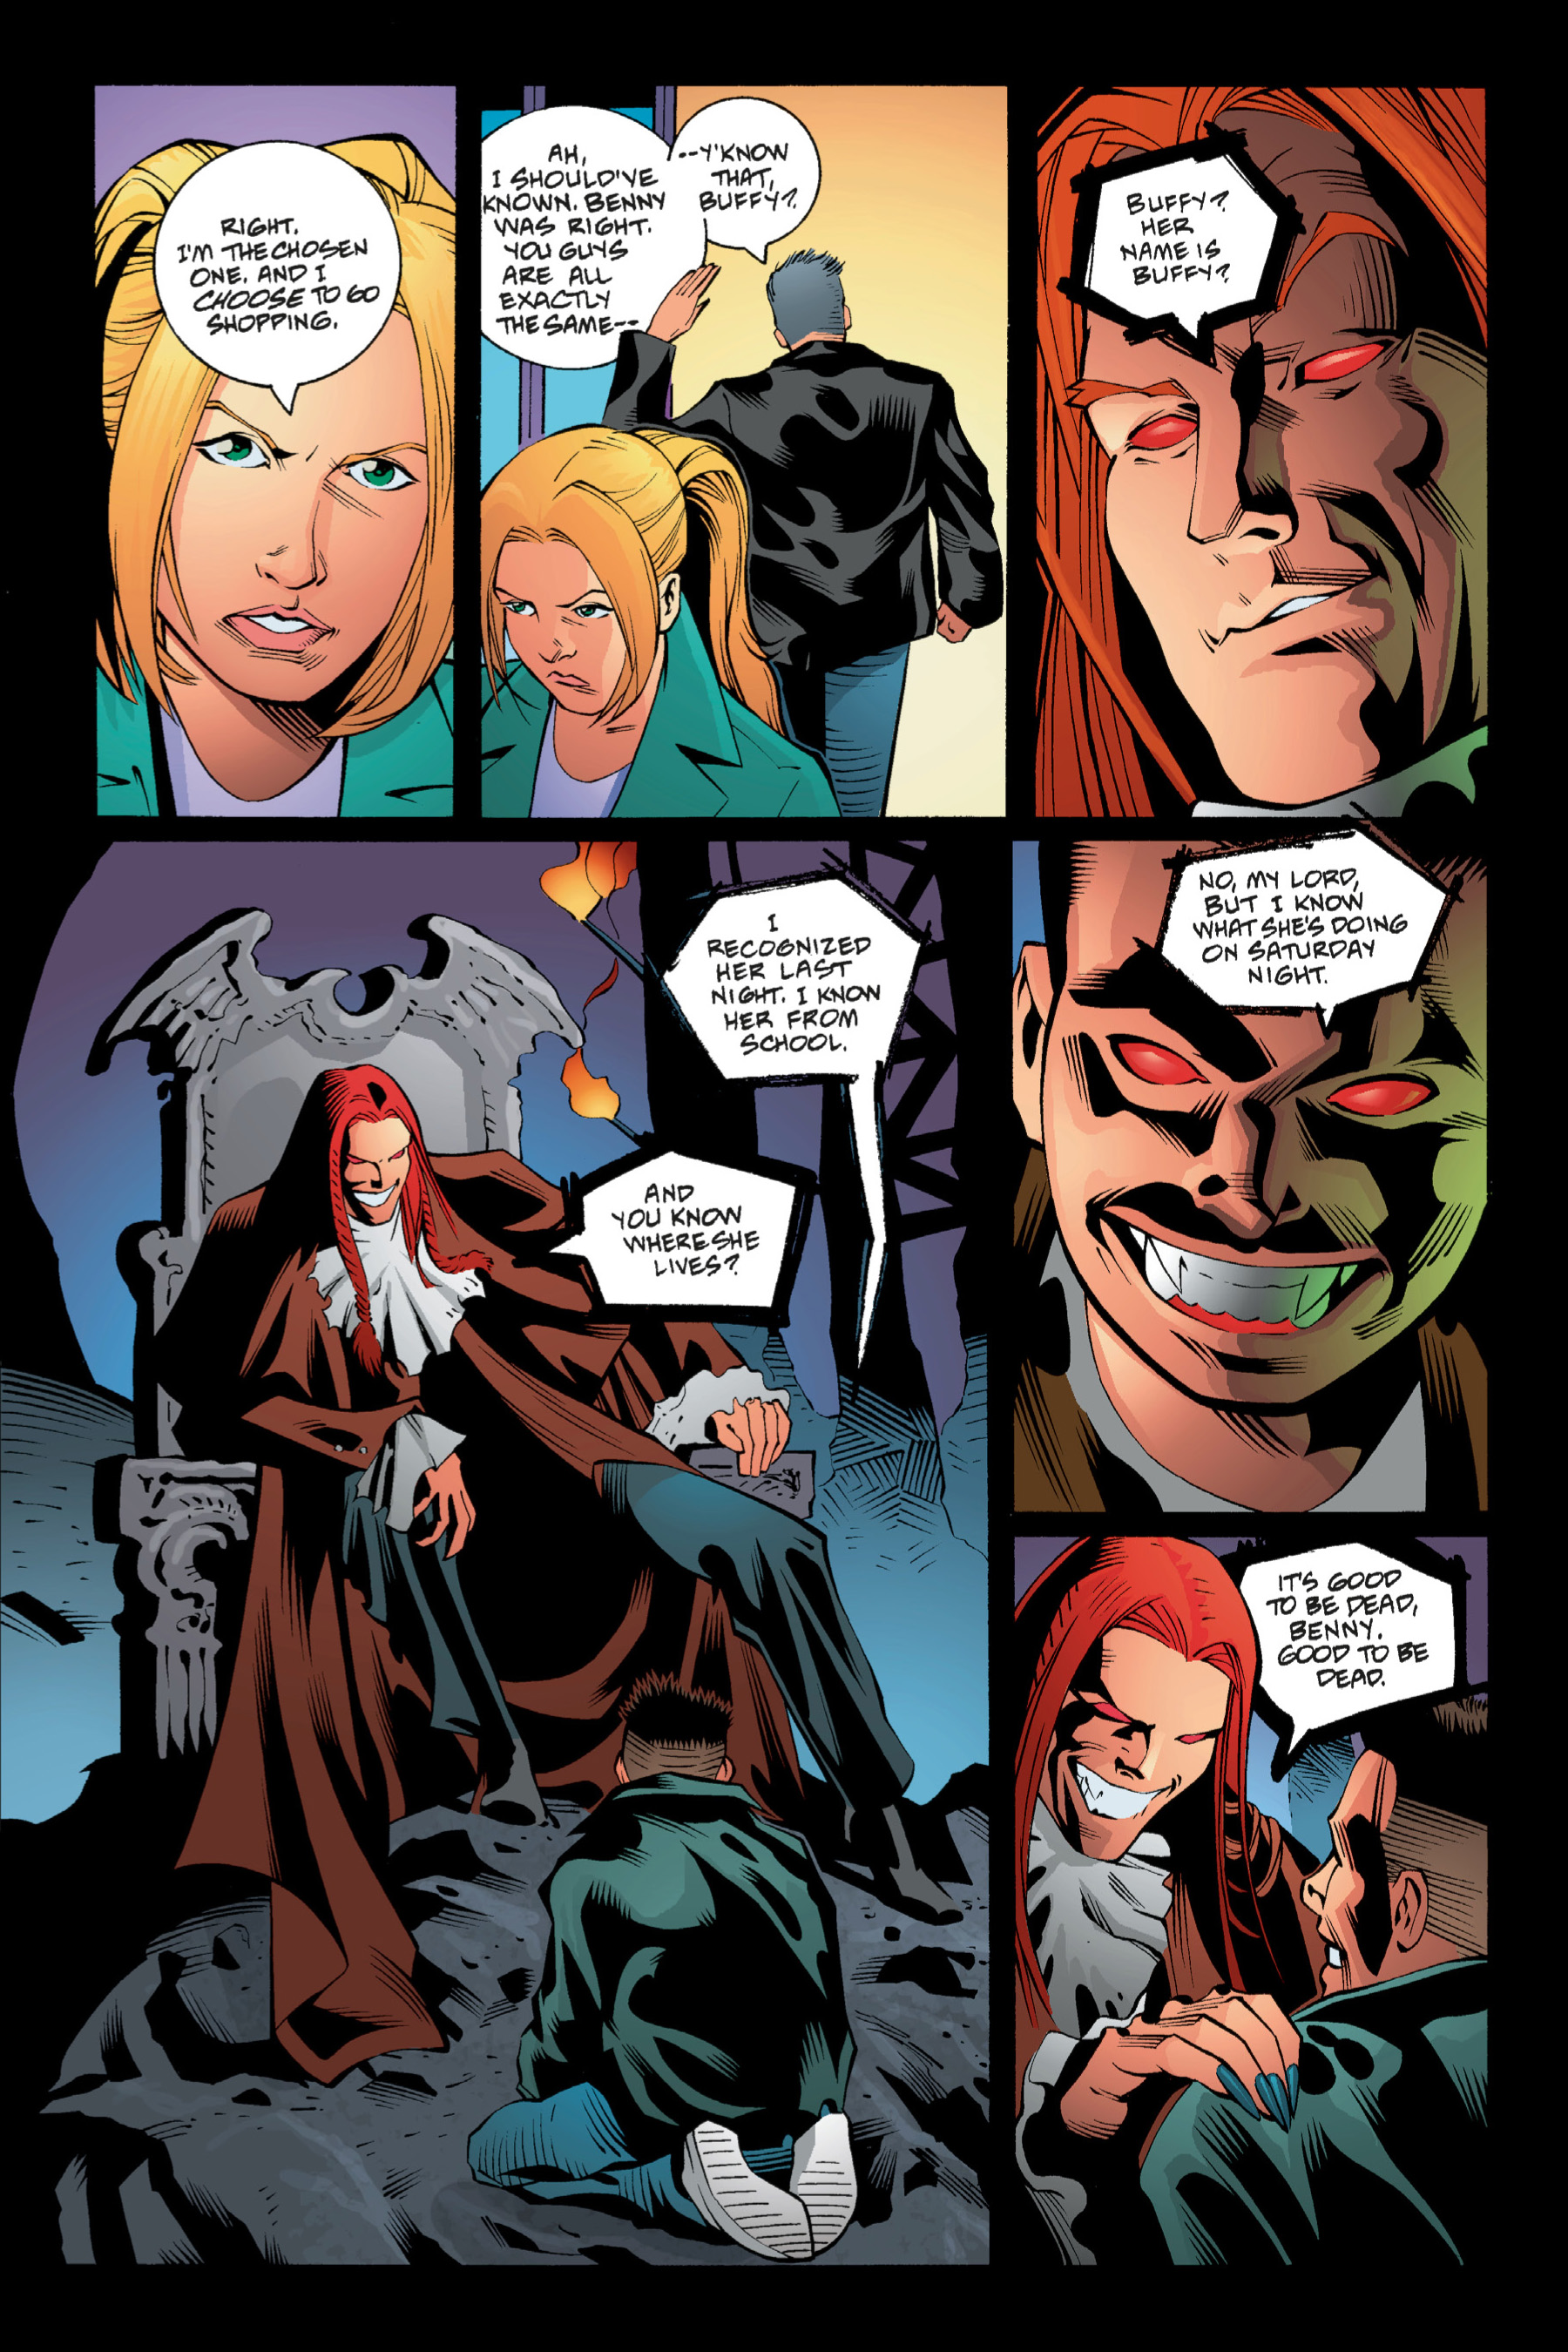 Read online Buffy the Vampire Slayer: Omnibus comic -  Issue # TPB 1 - 85